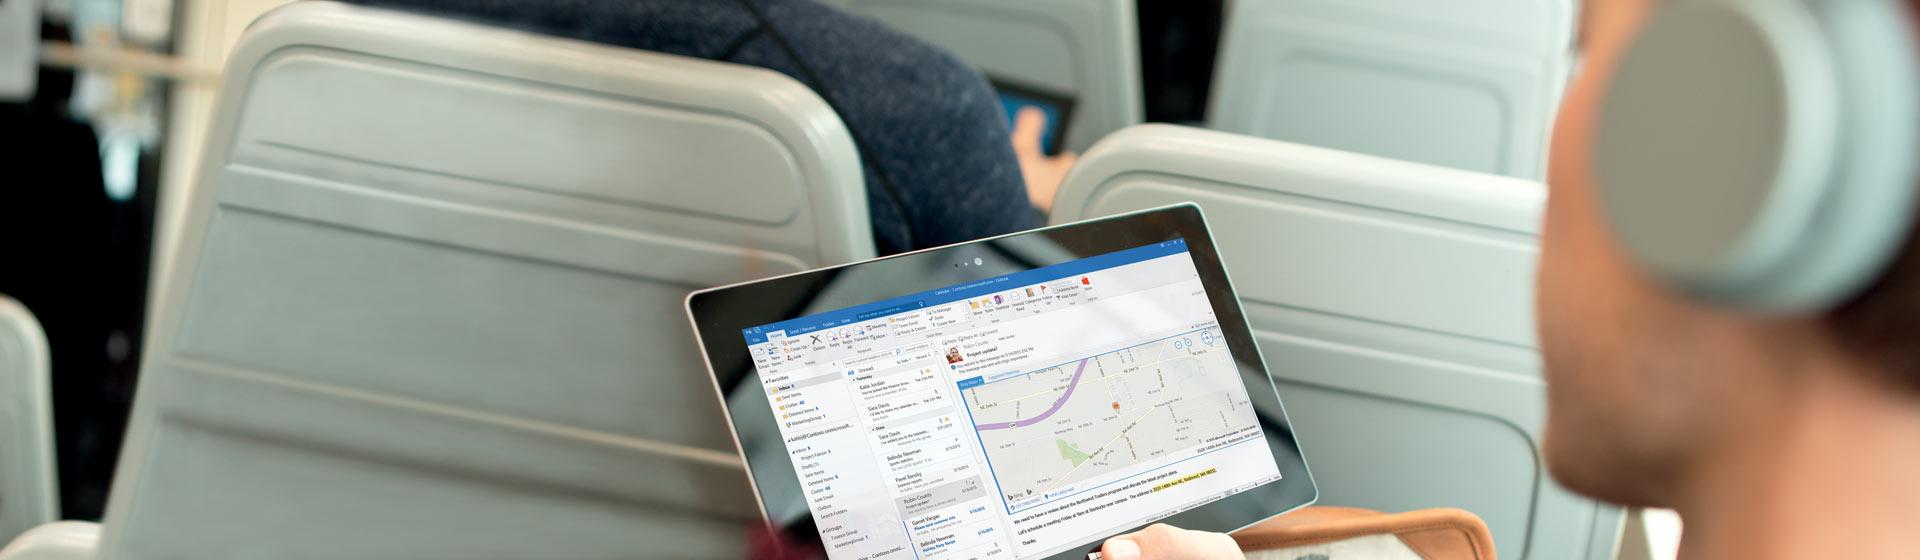 Office 365 전자 메일 받은 편지함이 표시된 태블릿을 들고 있는 남성